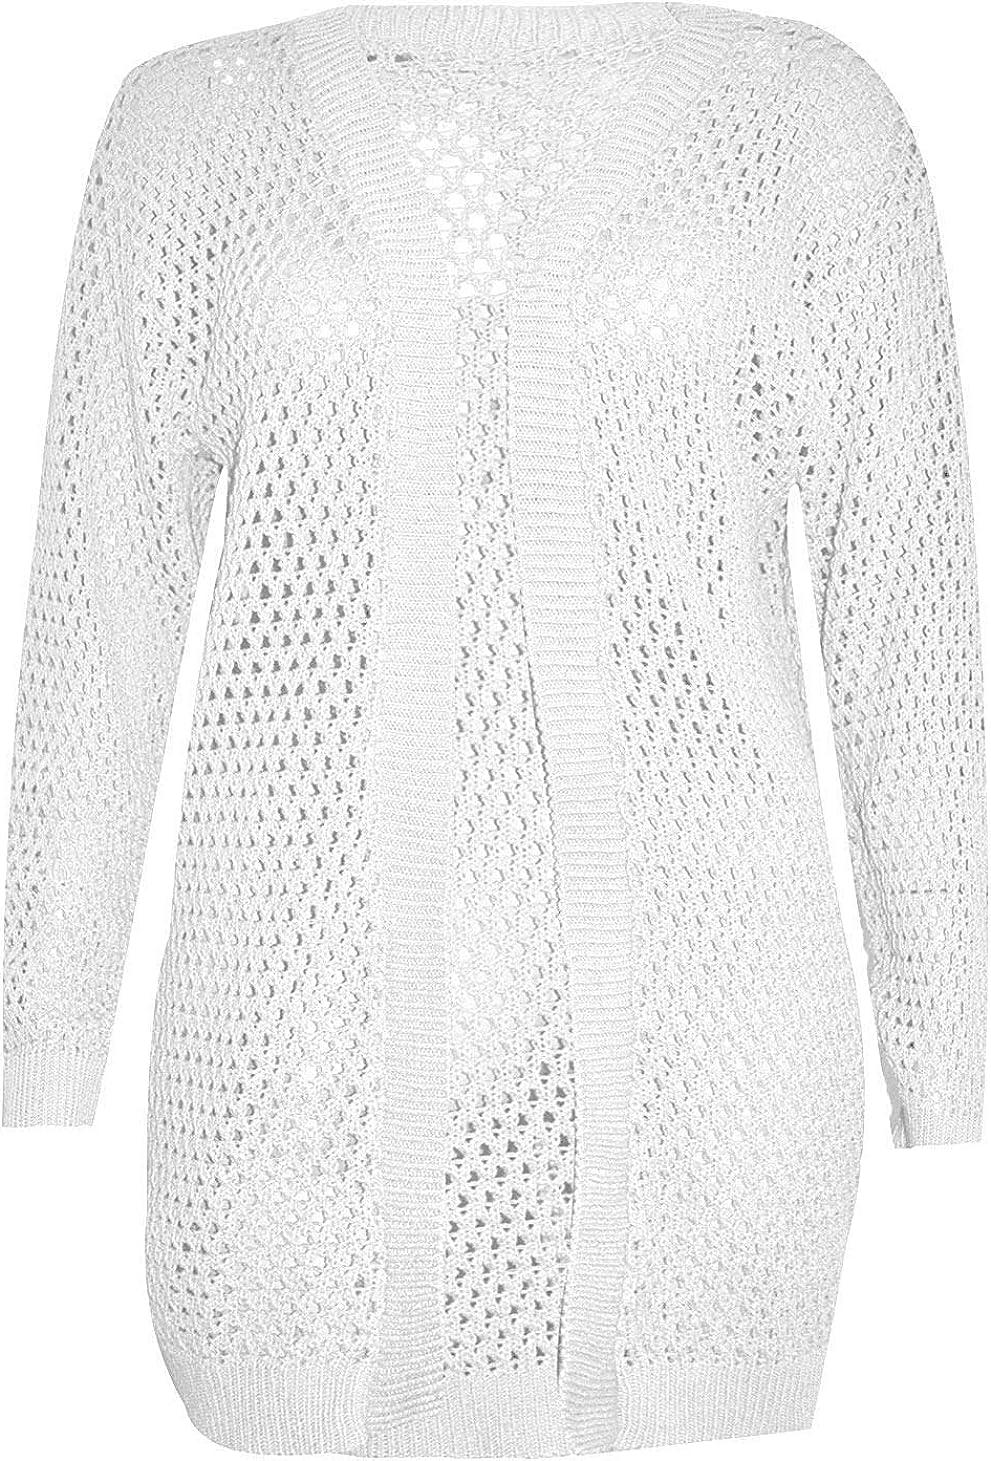 GirlzWalk New Women Ladies Fish Net Crochet Bolero Long Cardigan Plus Sizes Top